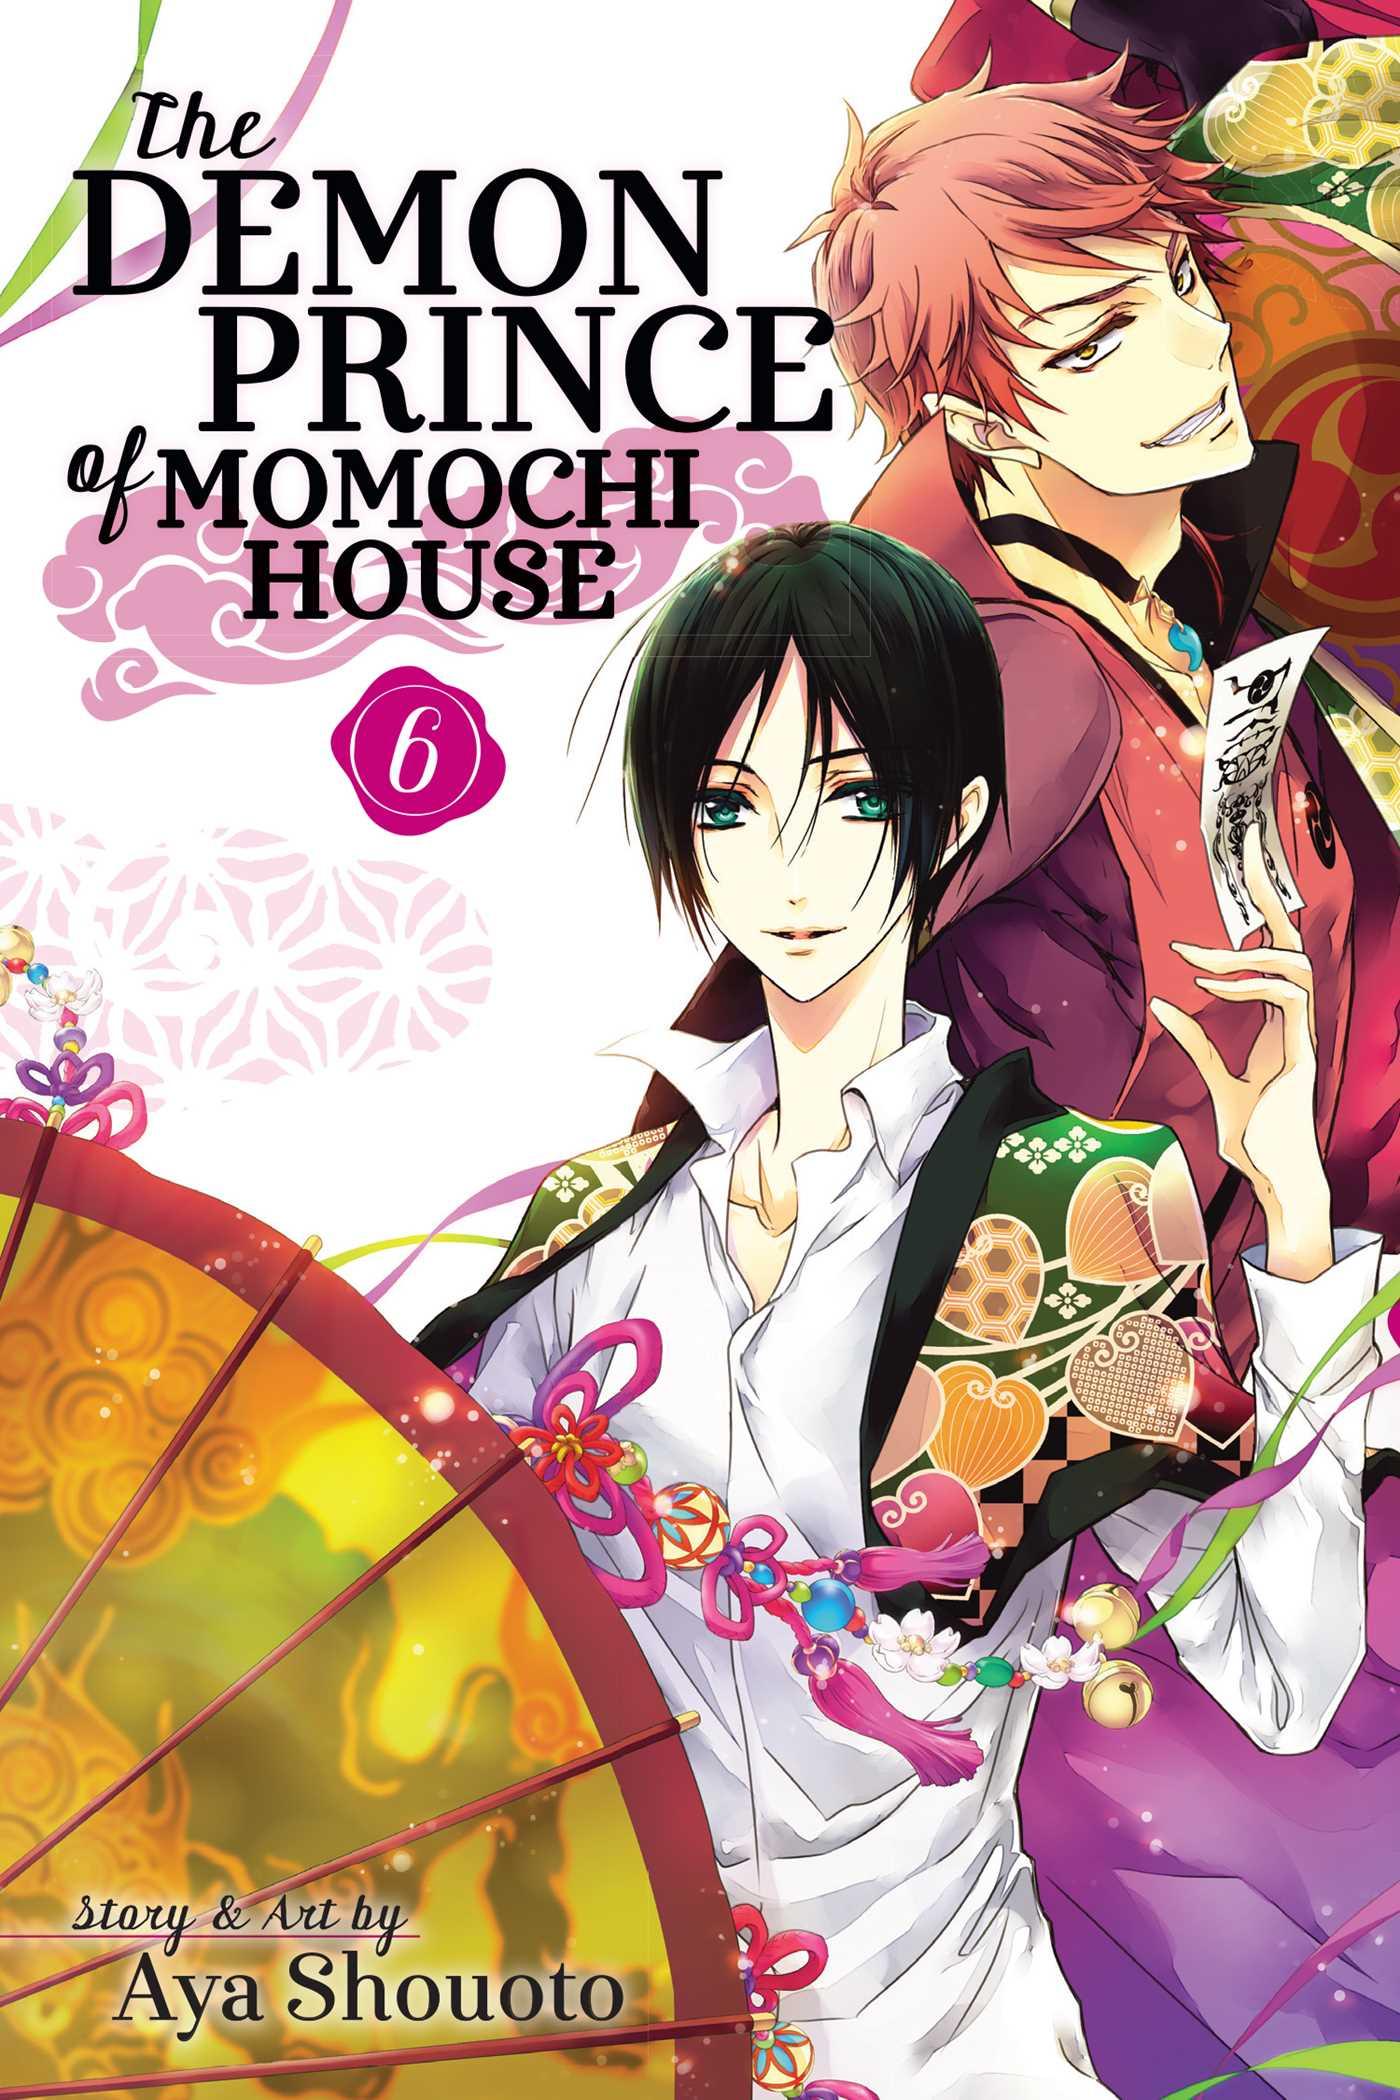 The Demon Prince Of Momochi House Manga Volume 6